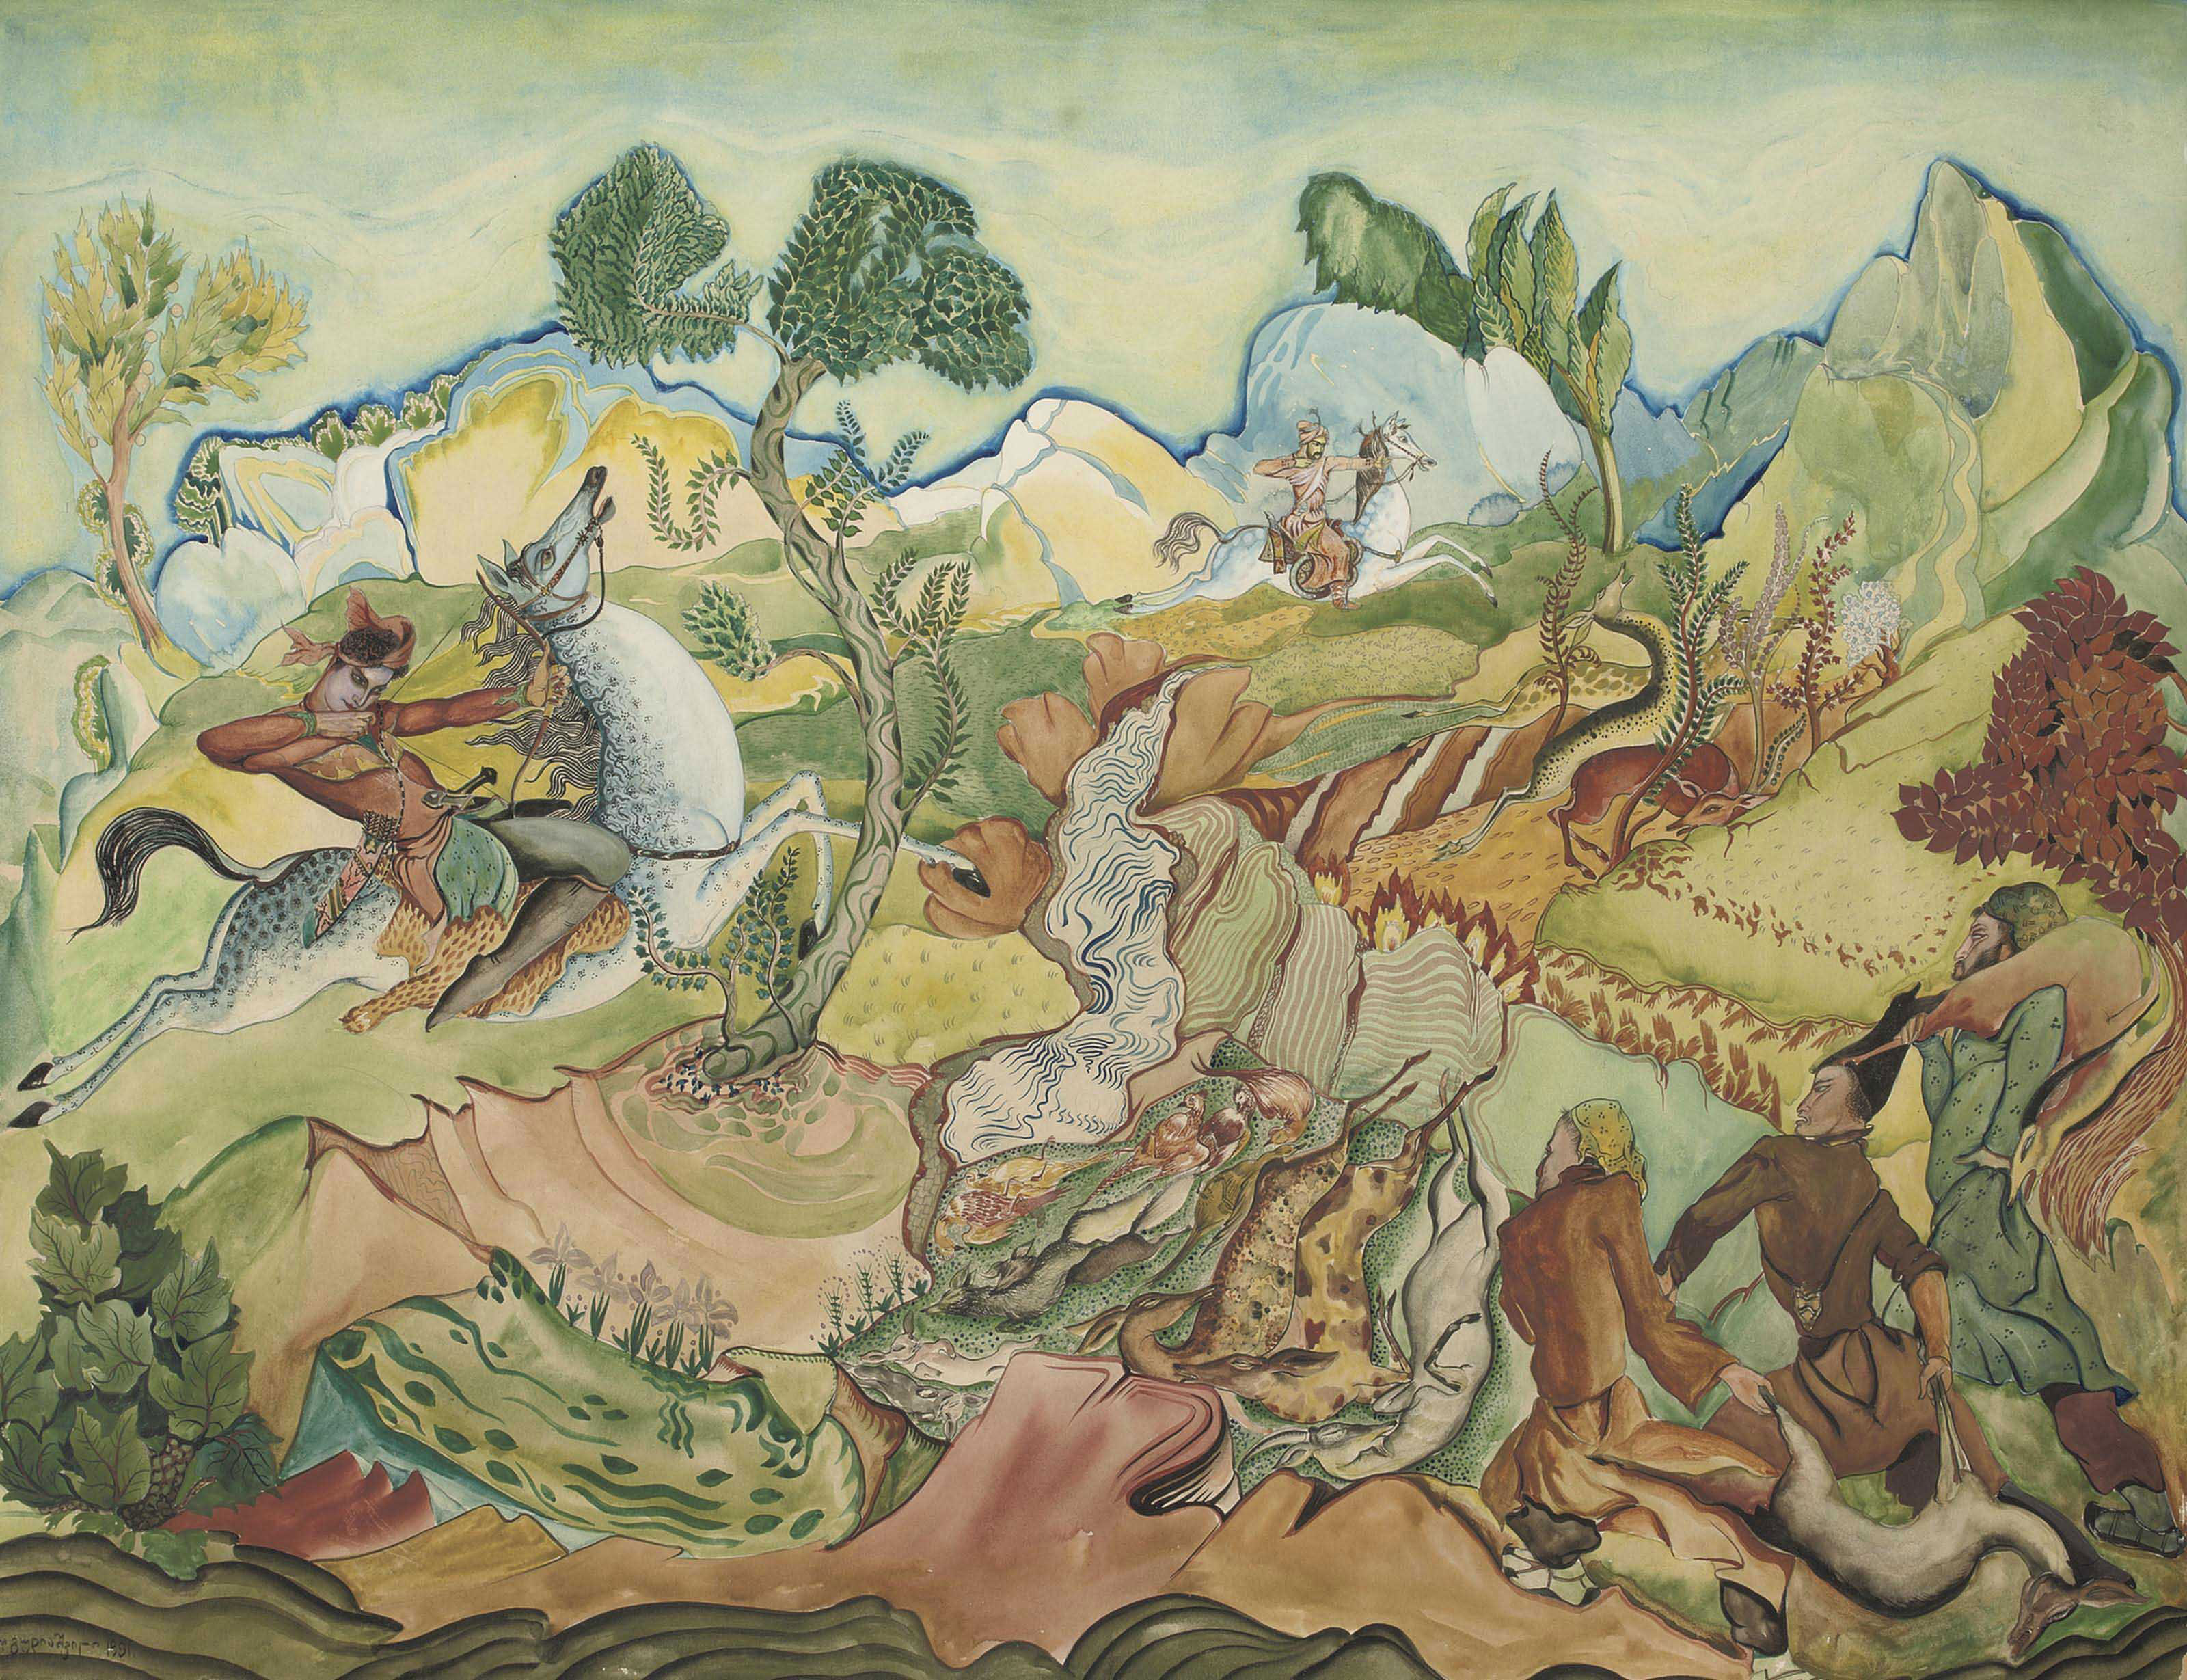 King Rostevan and Avtandil hunting